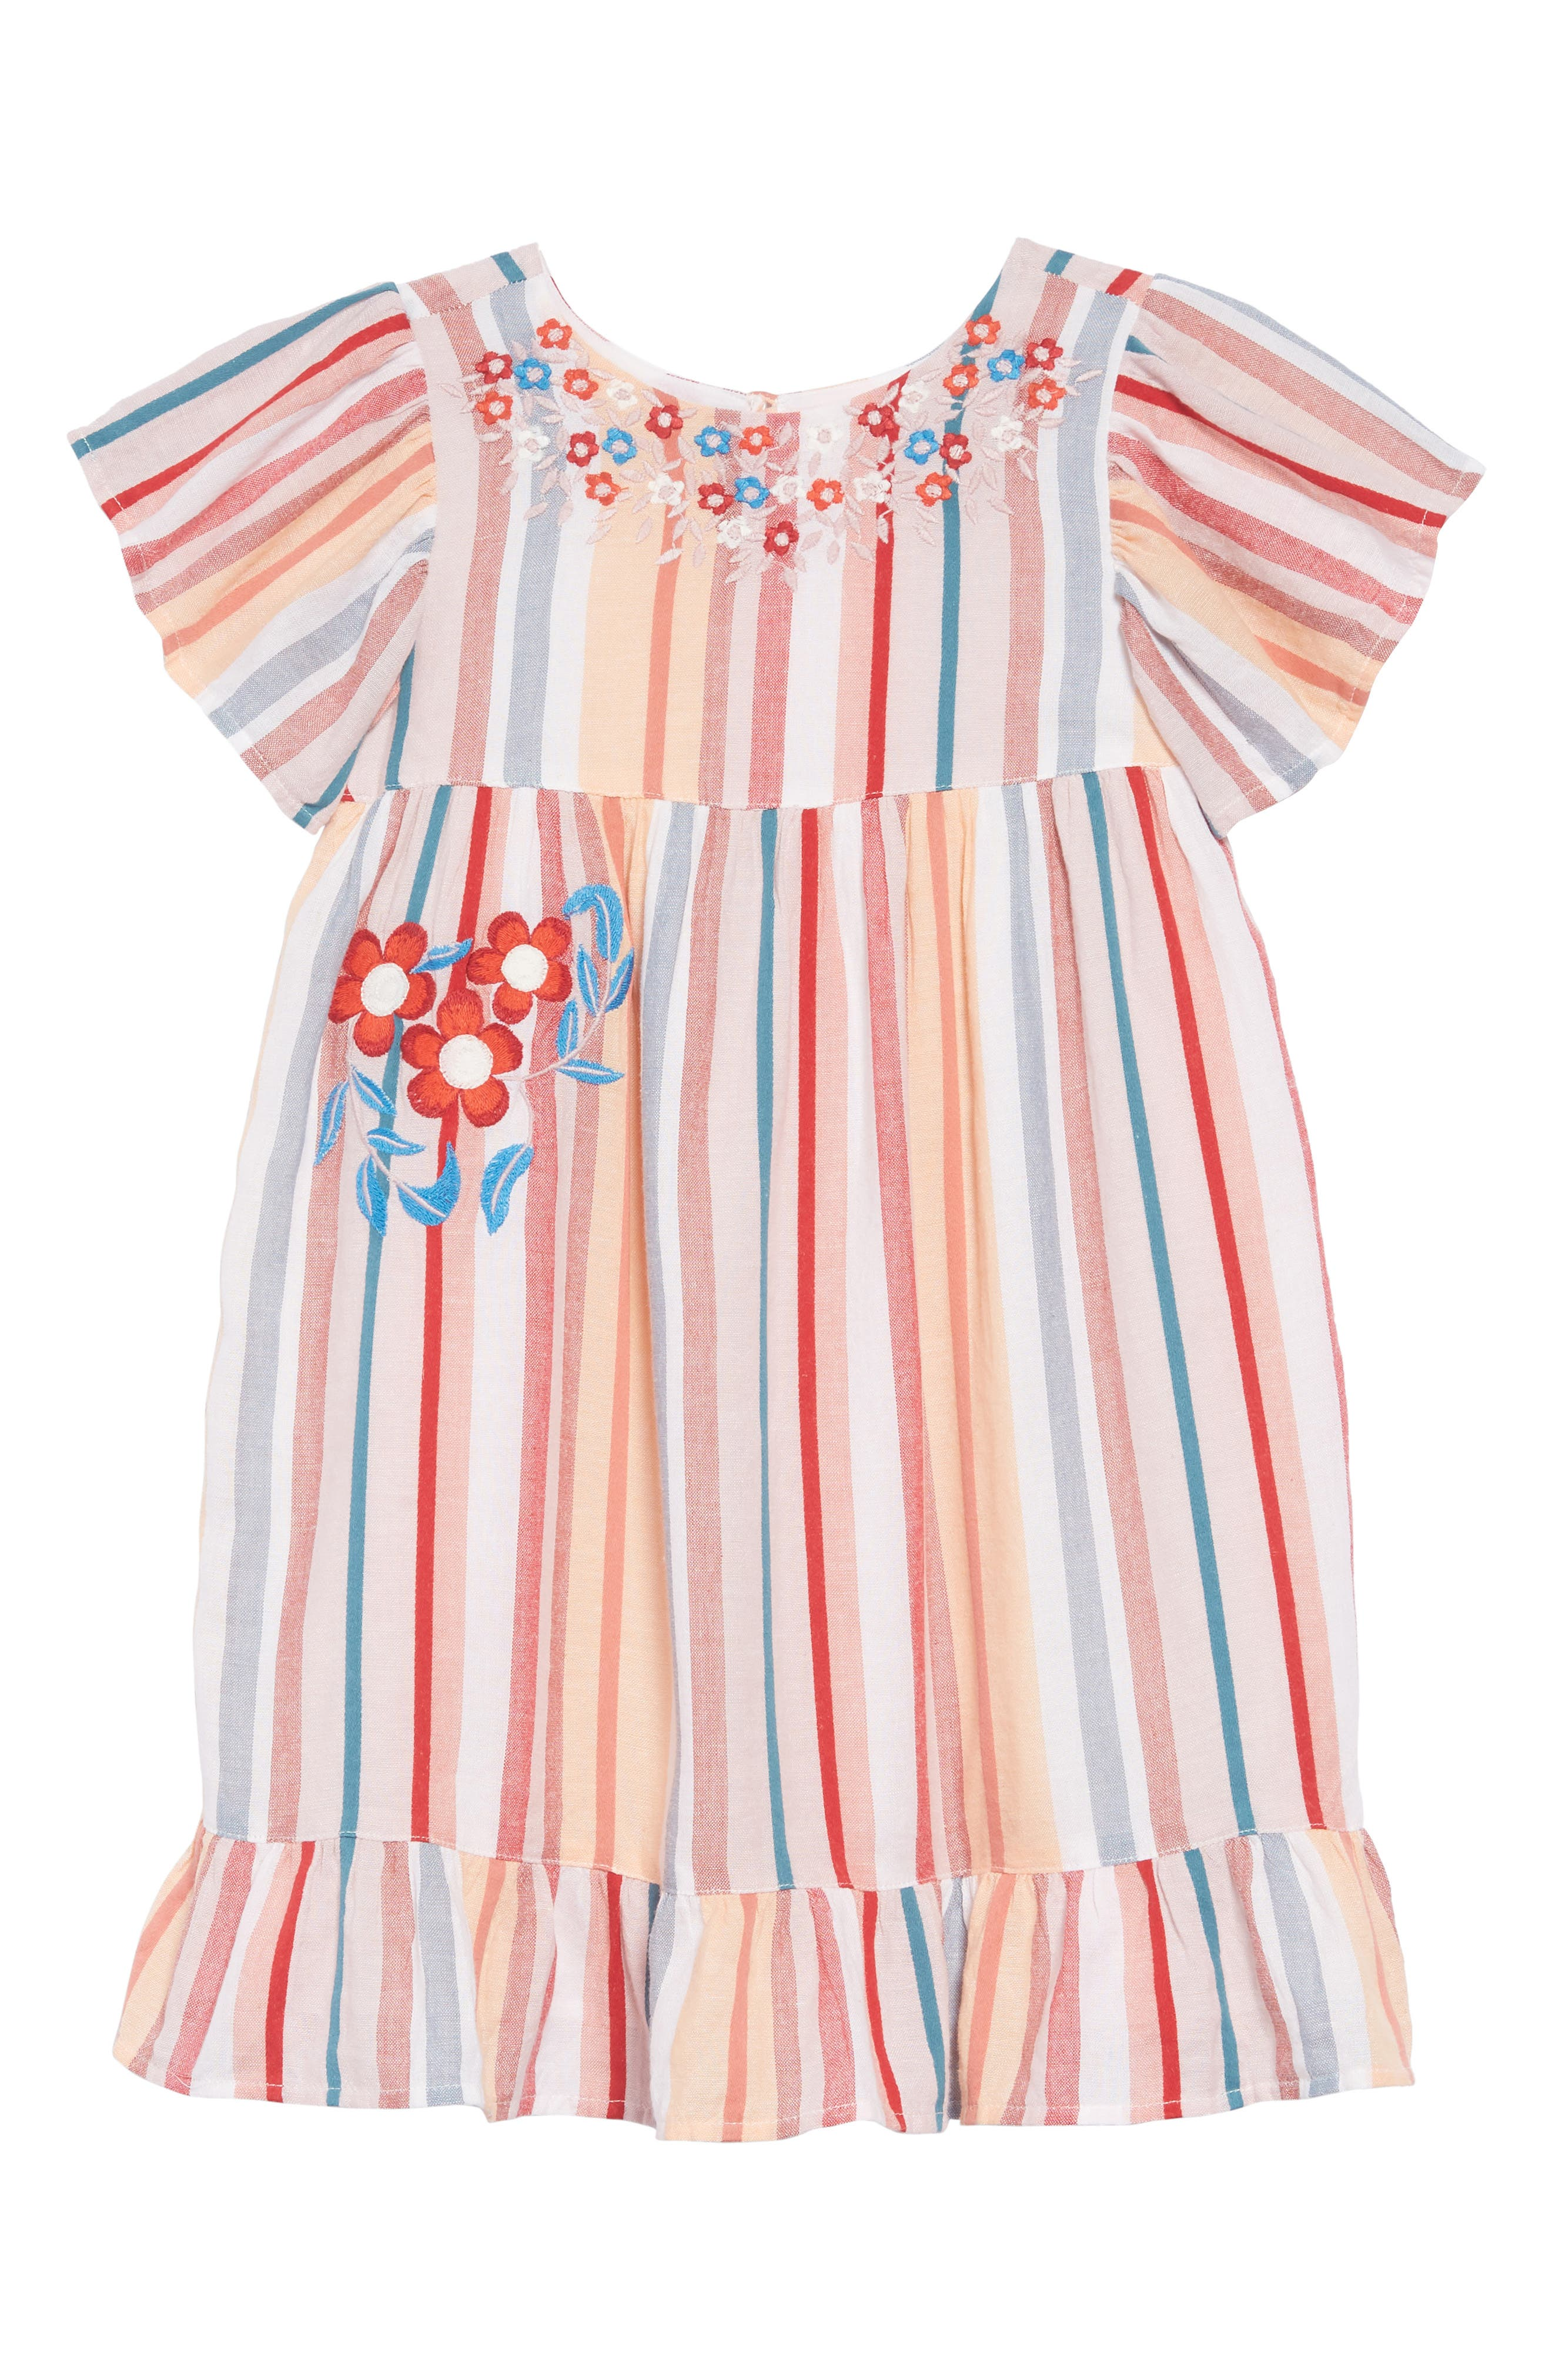 Embroidered Stripe Dress,                             Main thumbnail 1, color,                             IVORY EGRET MULTI STRIPE